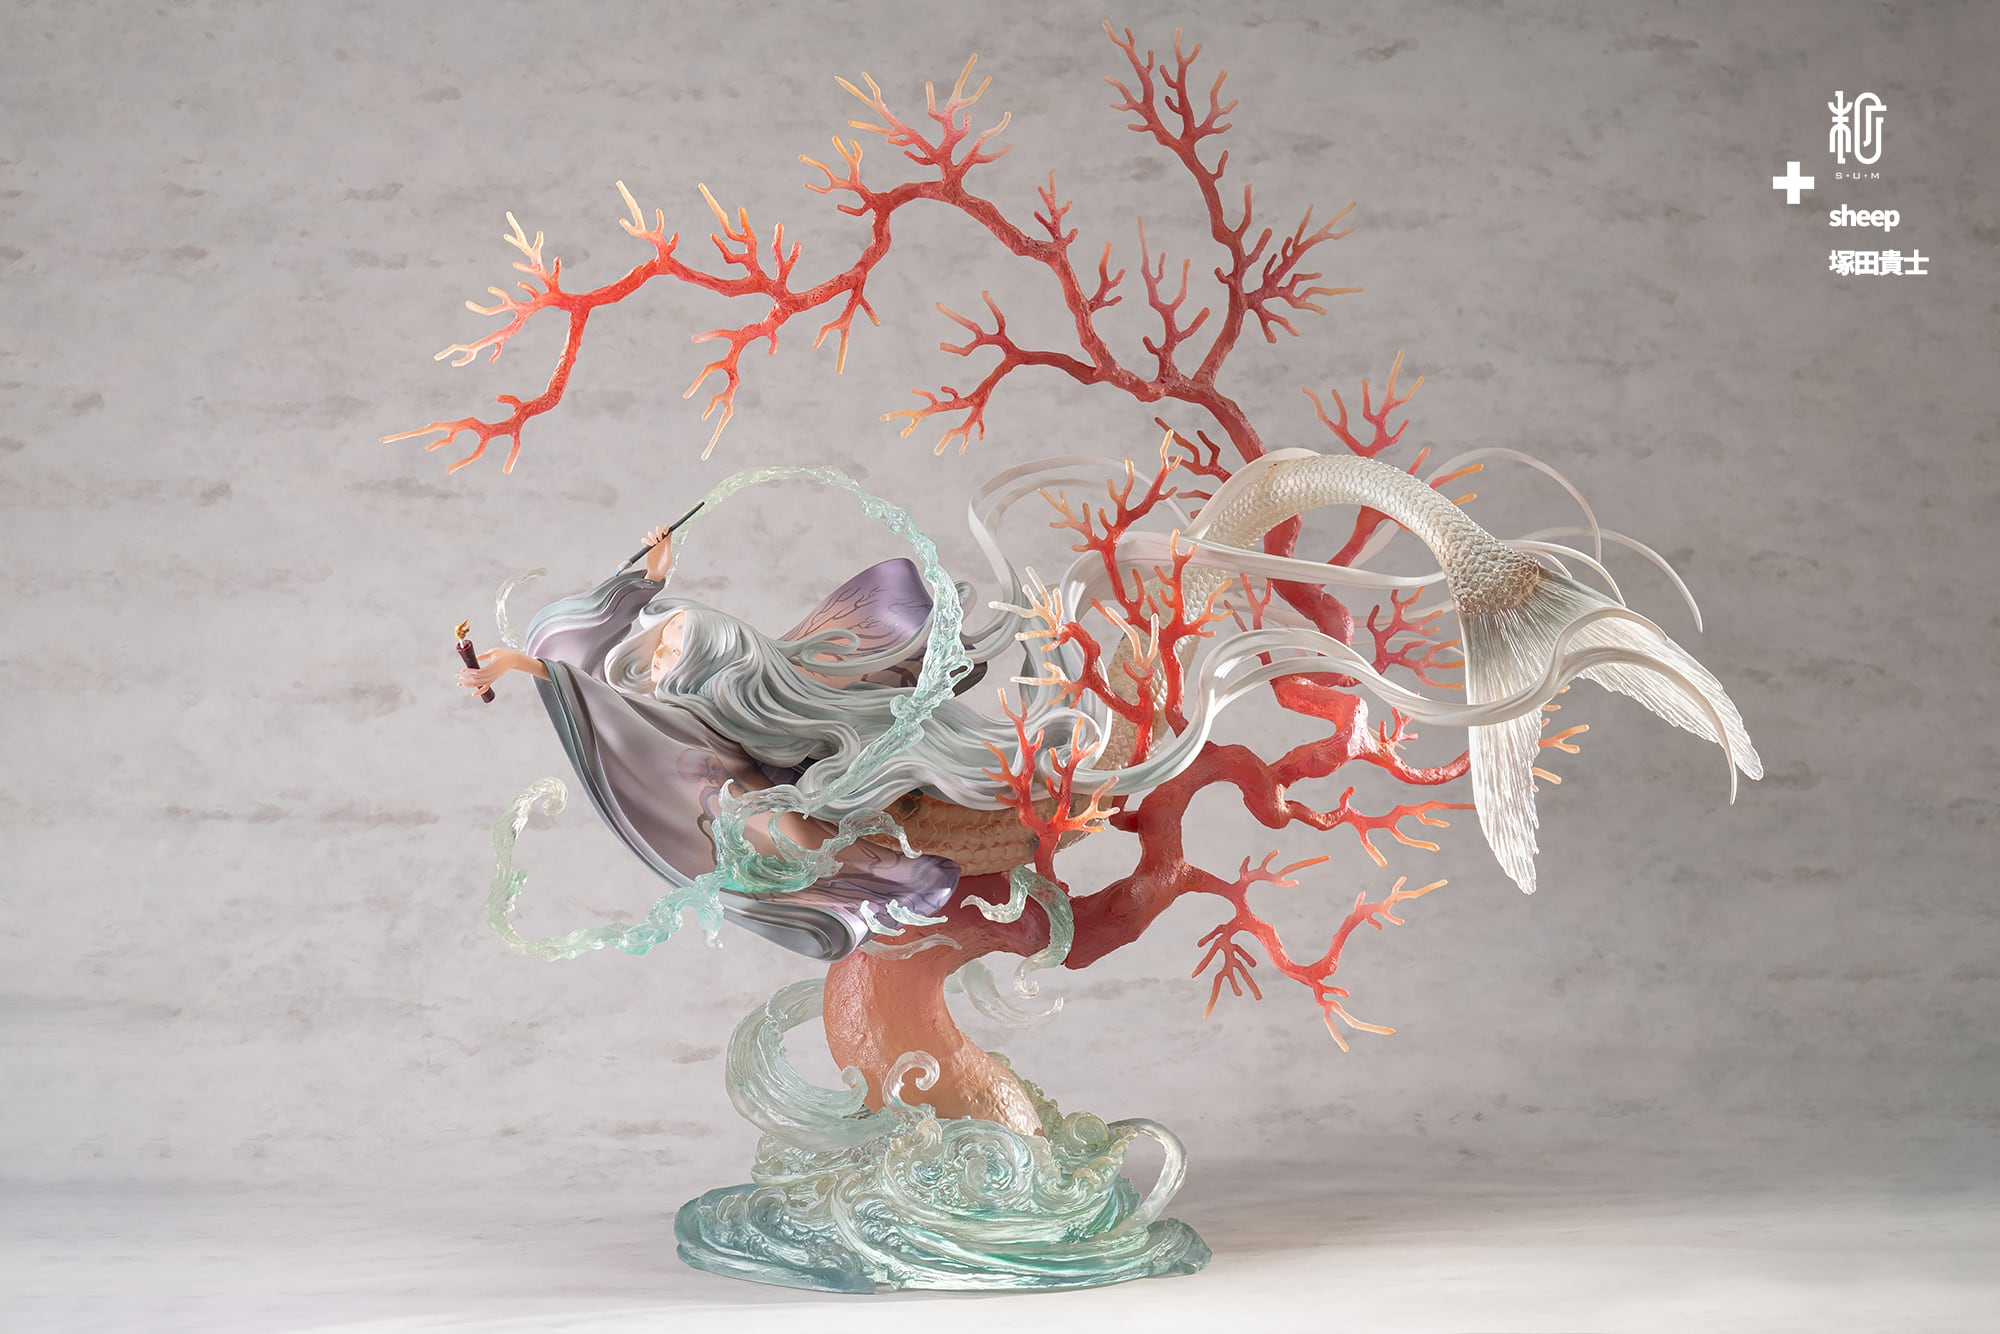 赤い蝋燭と人魚 赤珊瑚ver 100体限定|sheep×塚田貴士